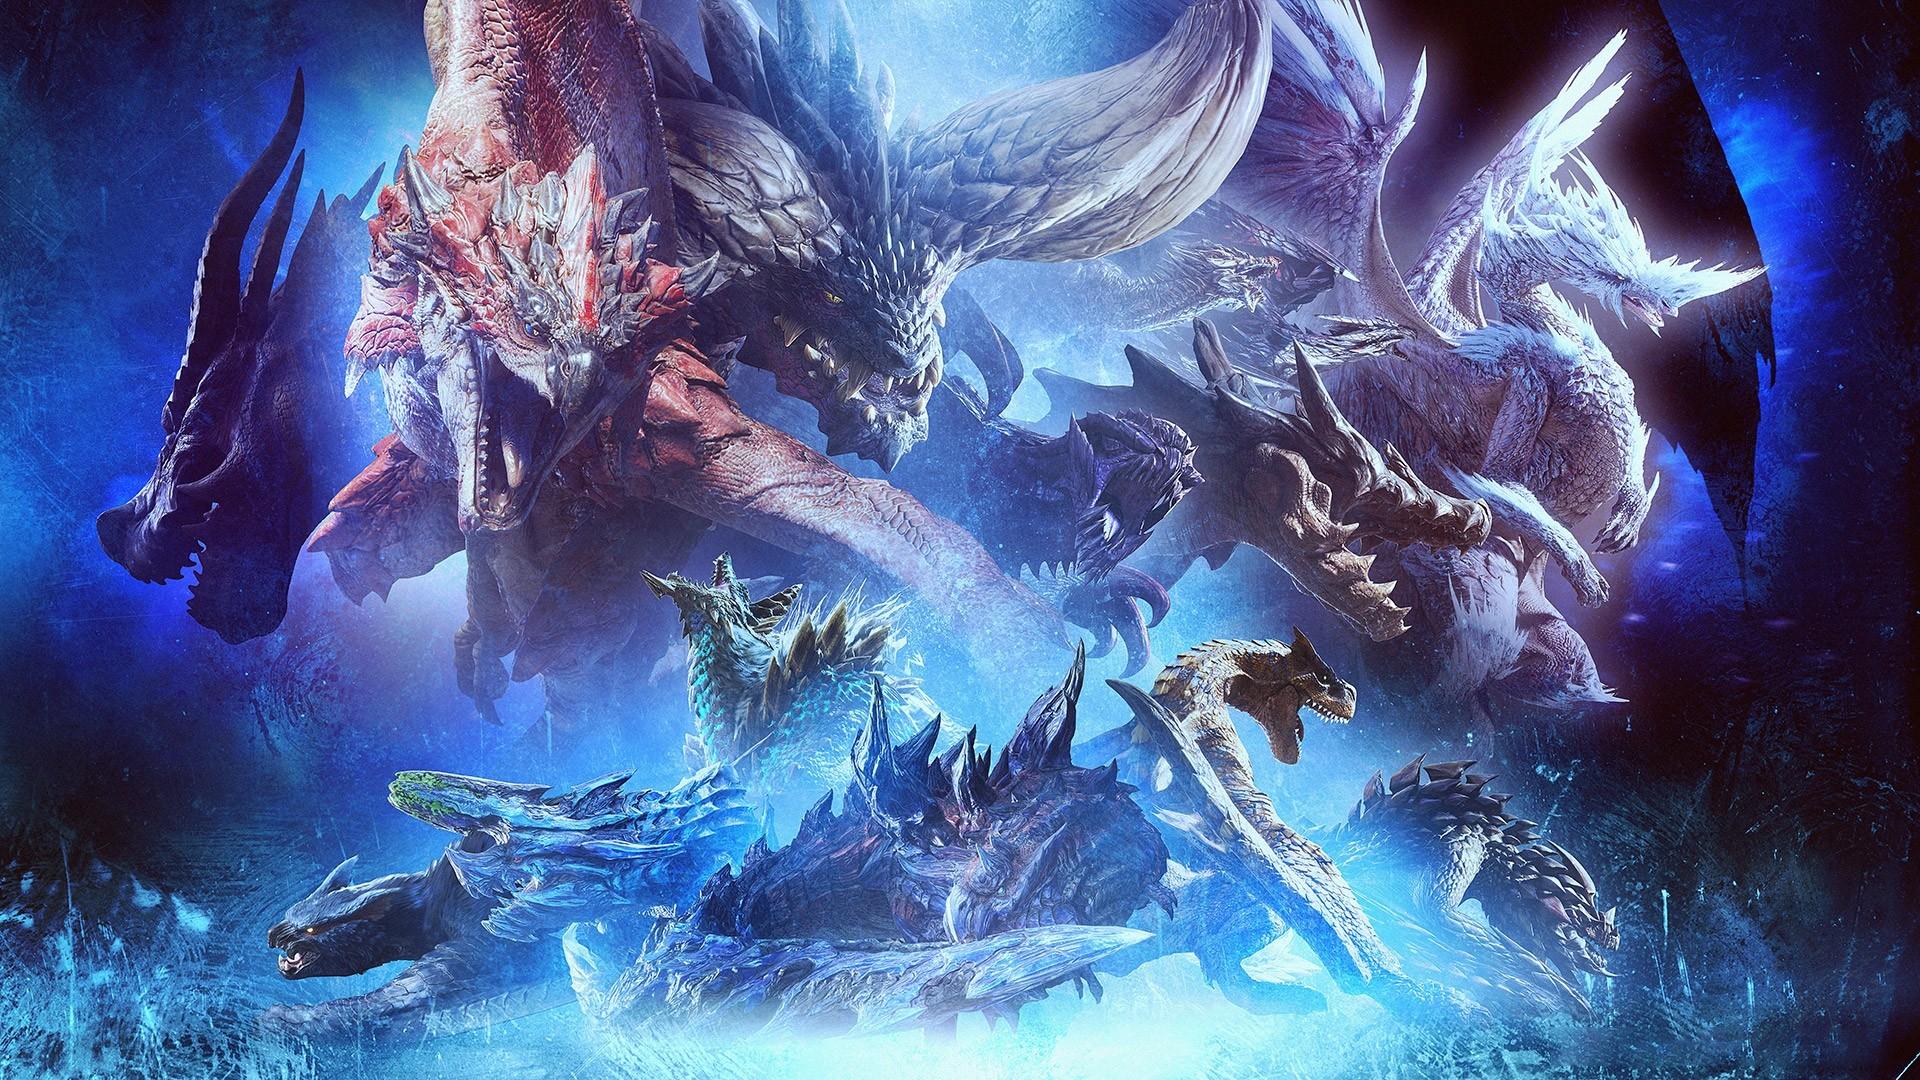 Monster Hunter World PC Wallpaper HD